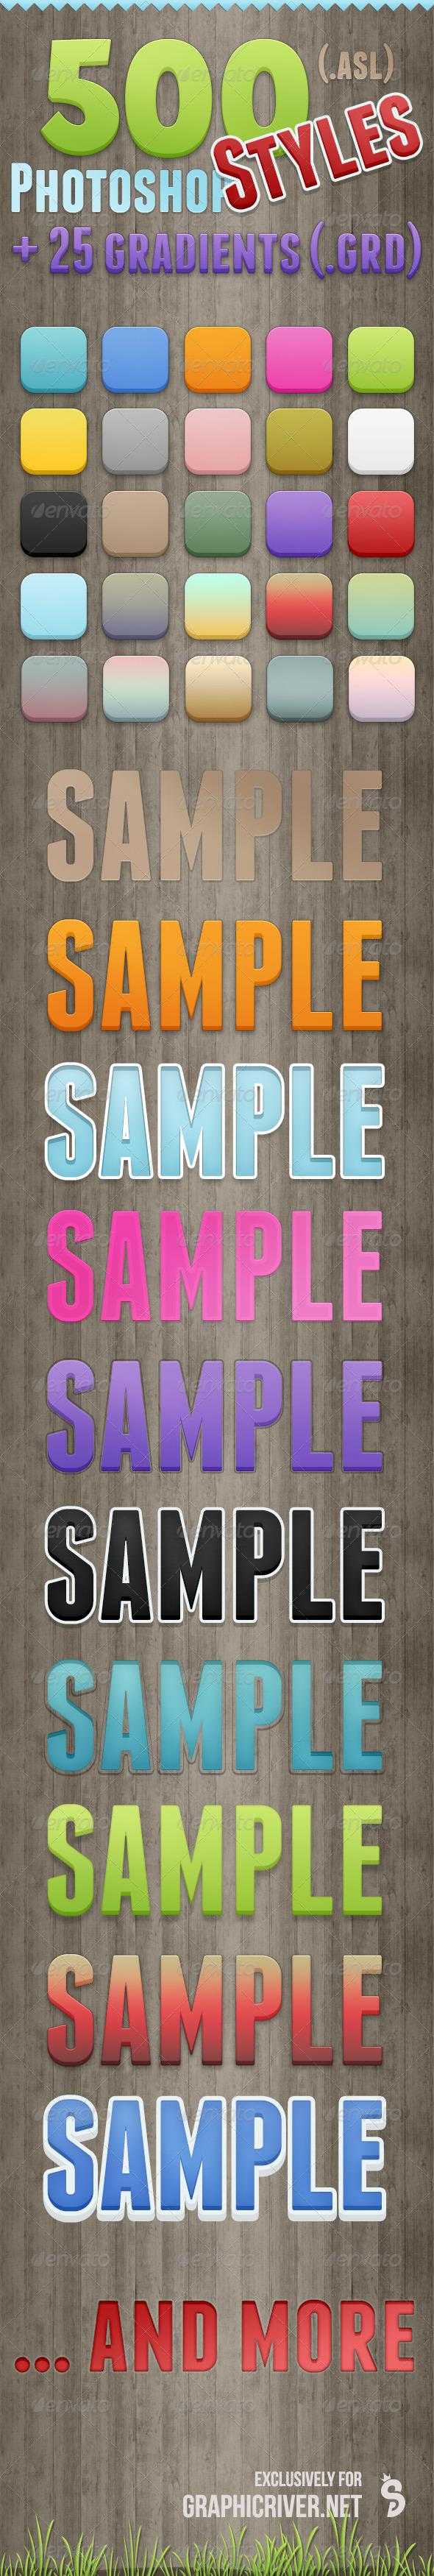 GraphicRiver 500 Photoshop Styles 7747288